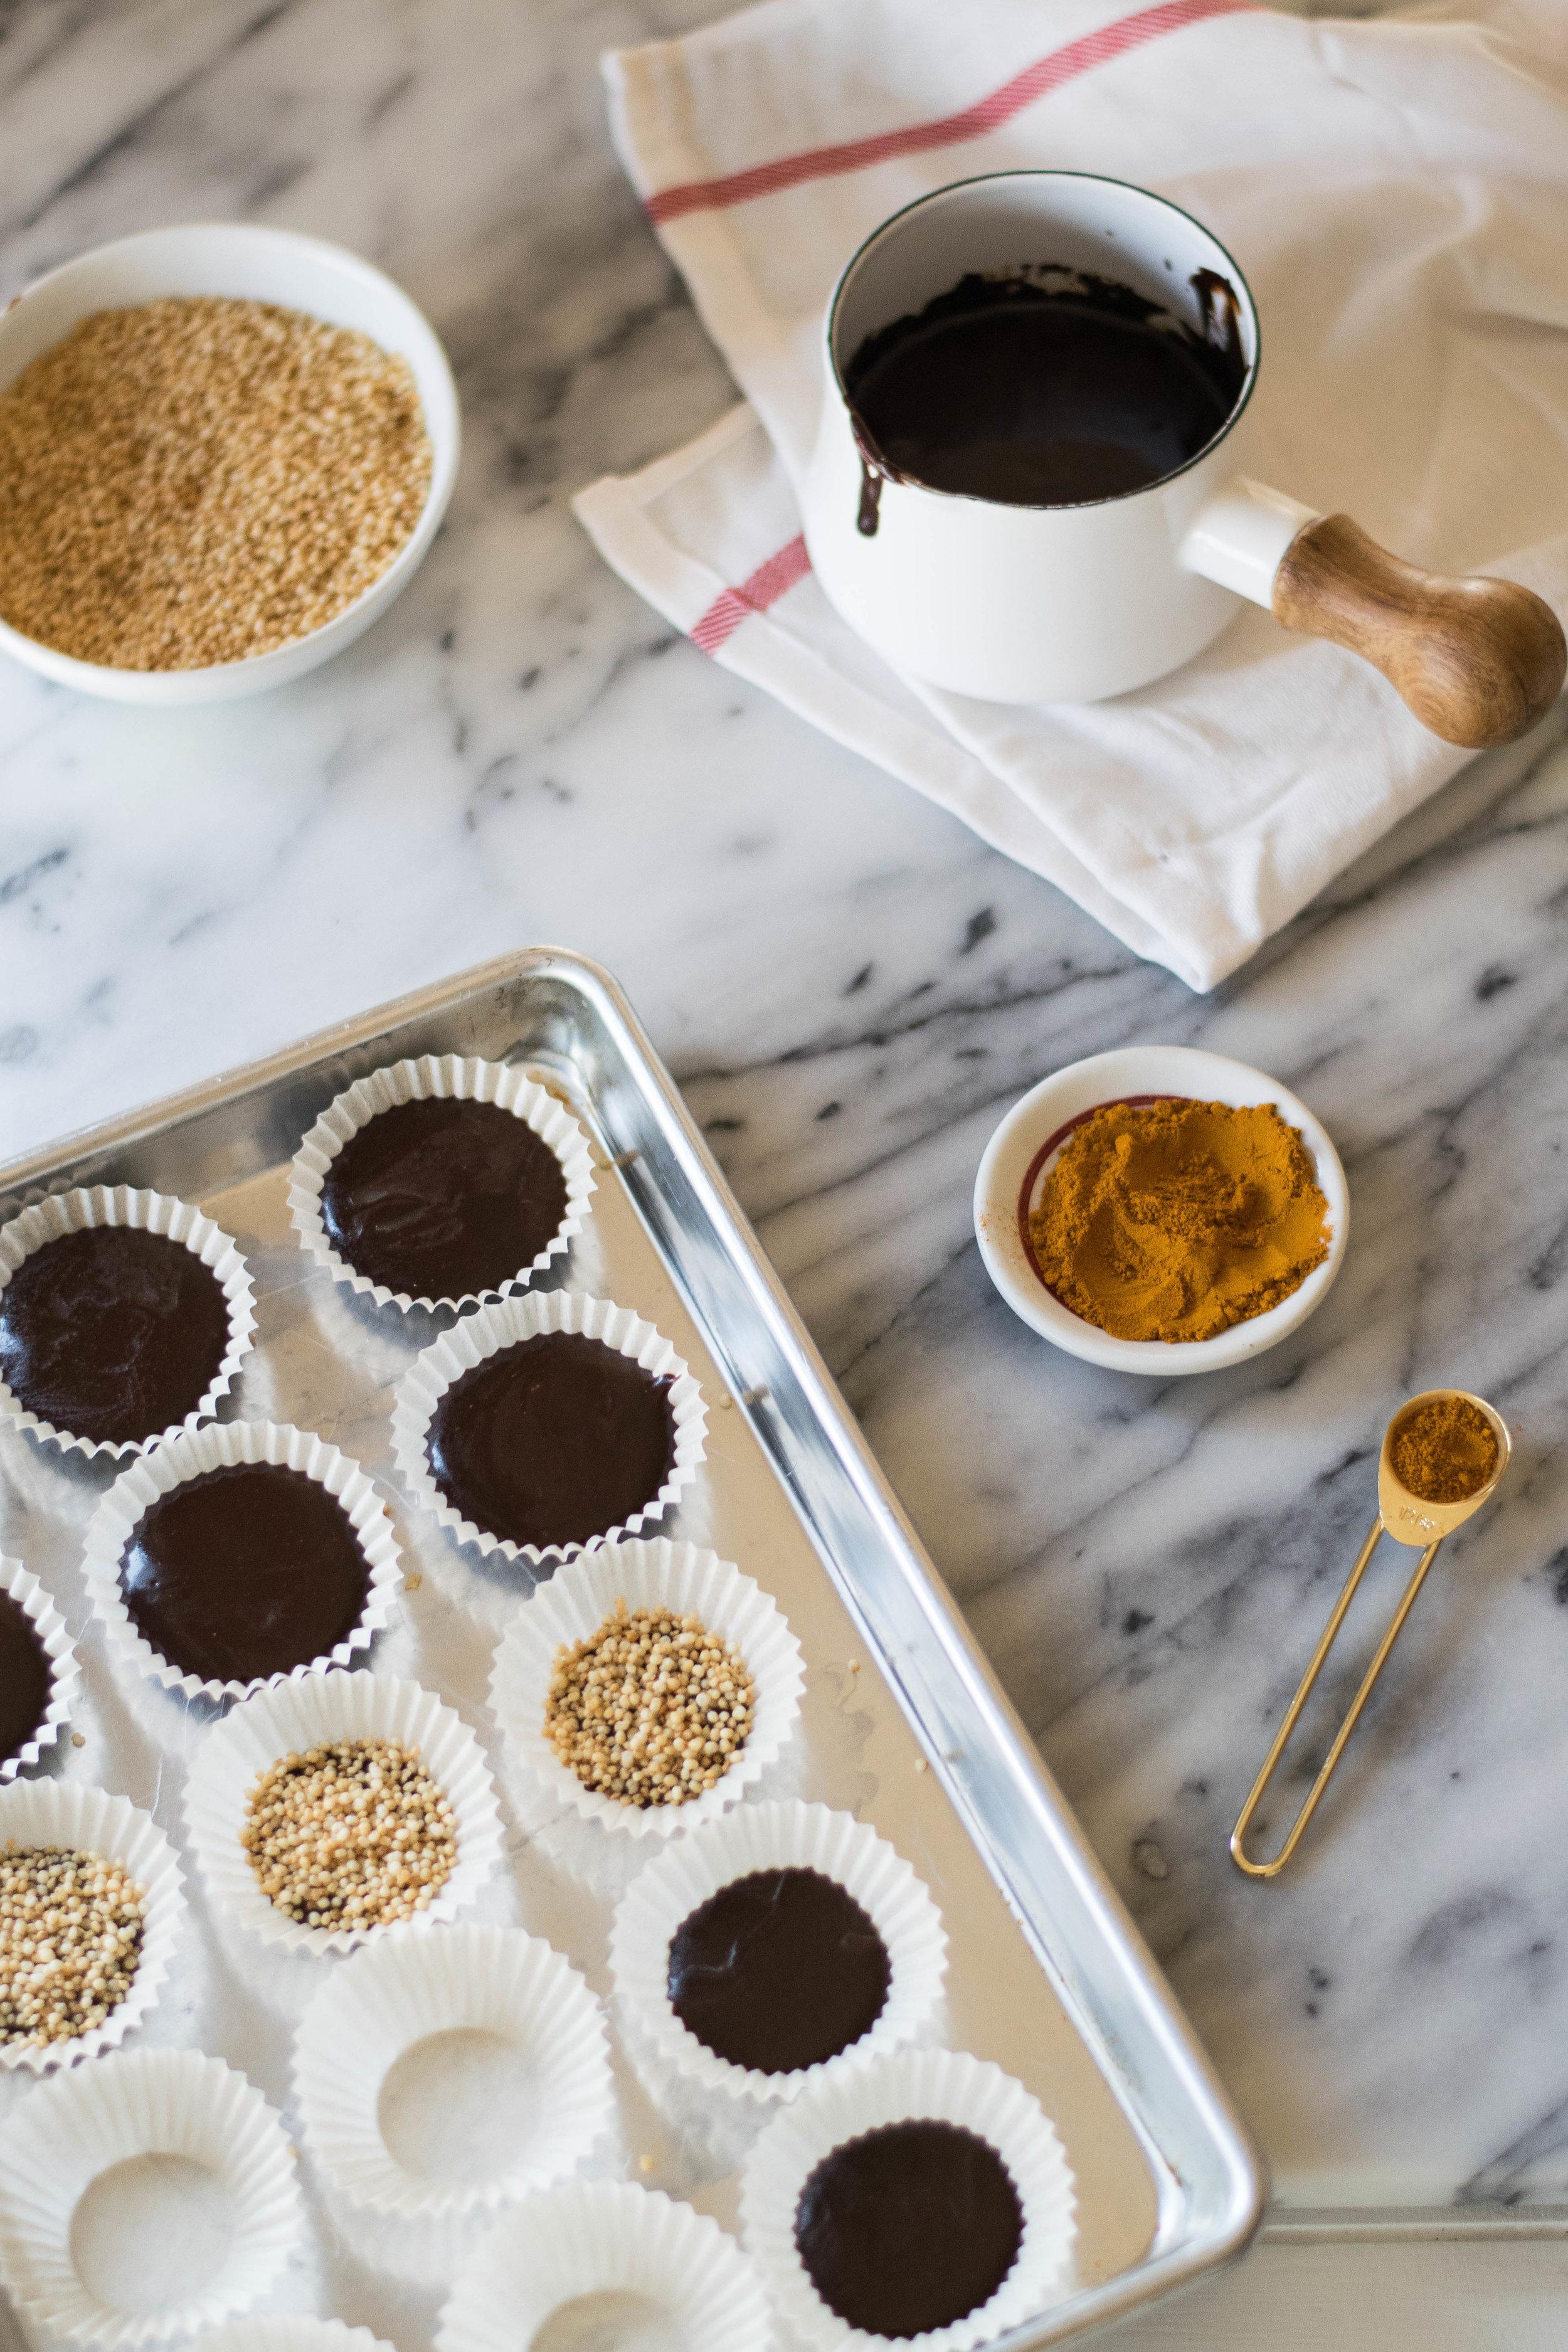 Golden Milk Chocolate Crunch Cups | All Purpose Flour Child